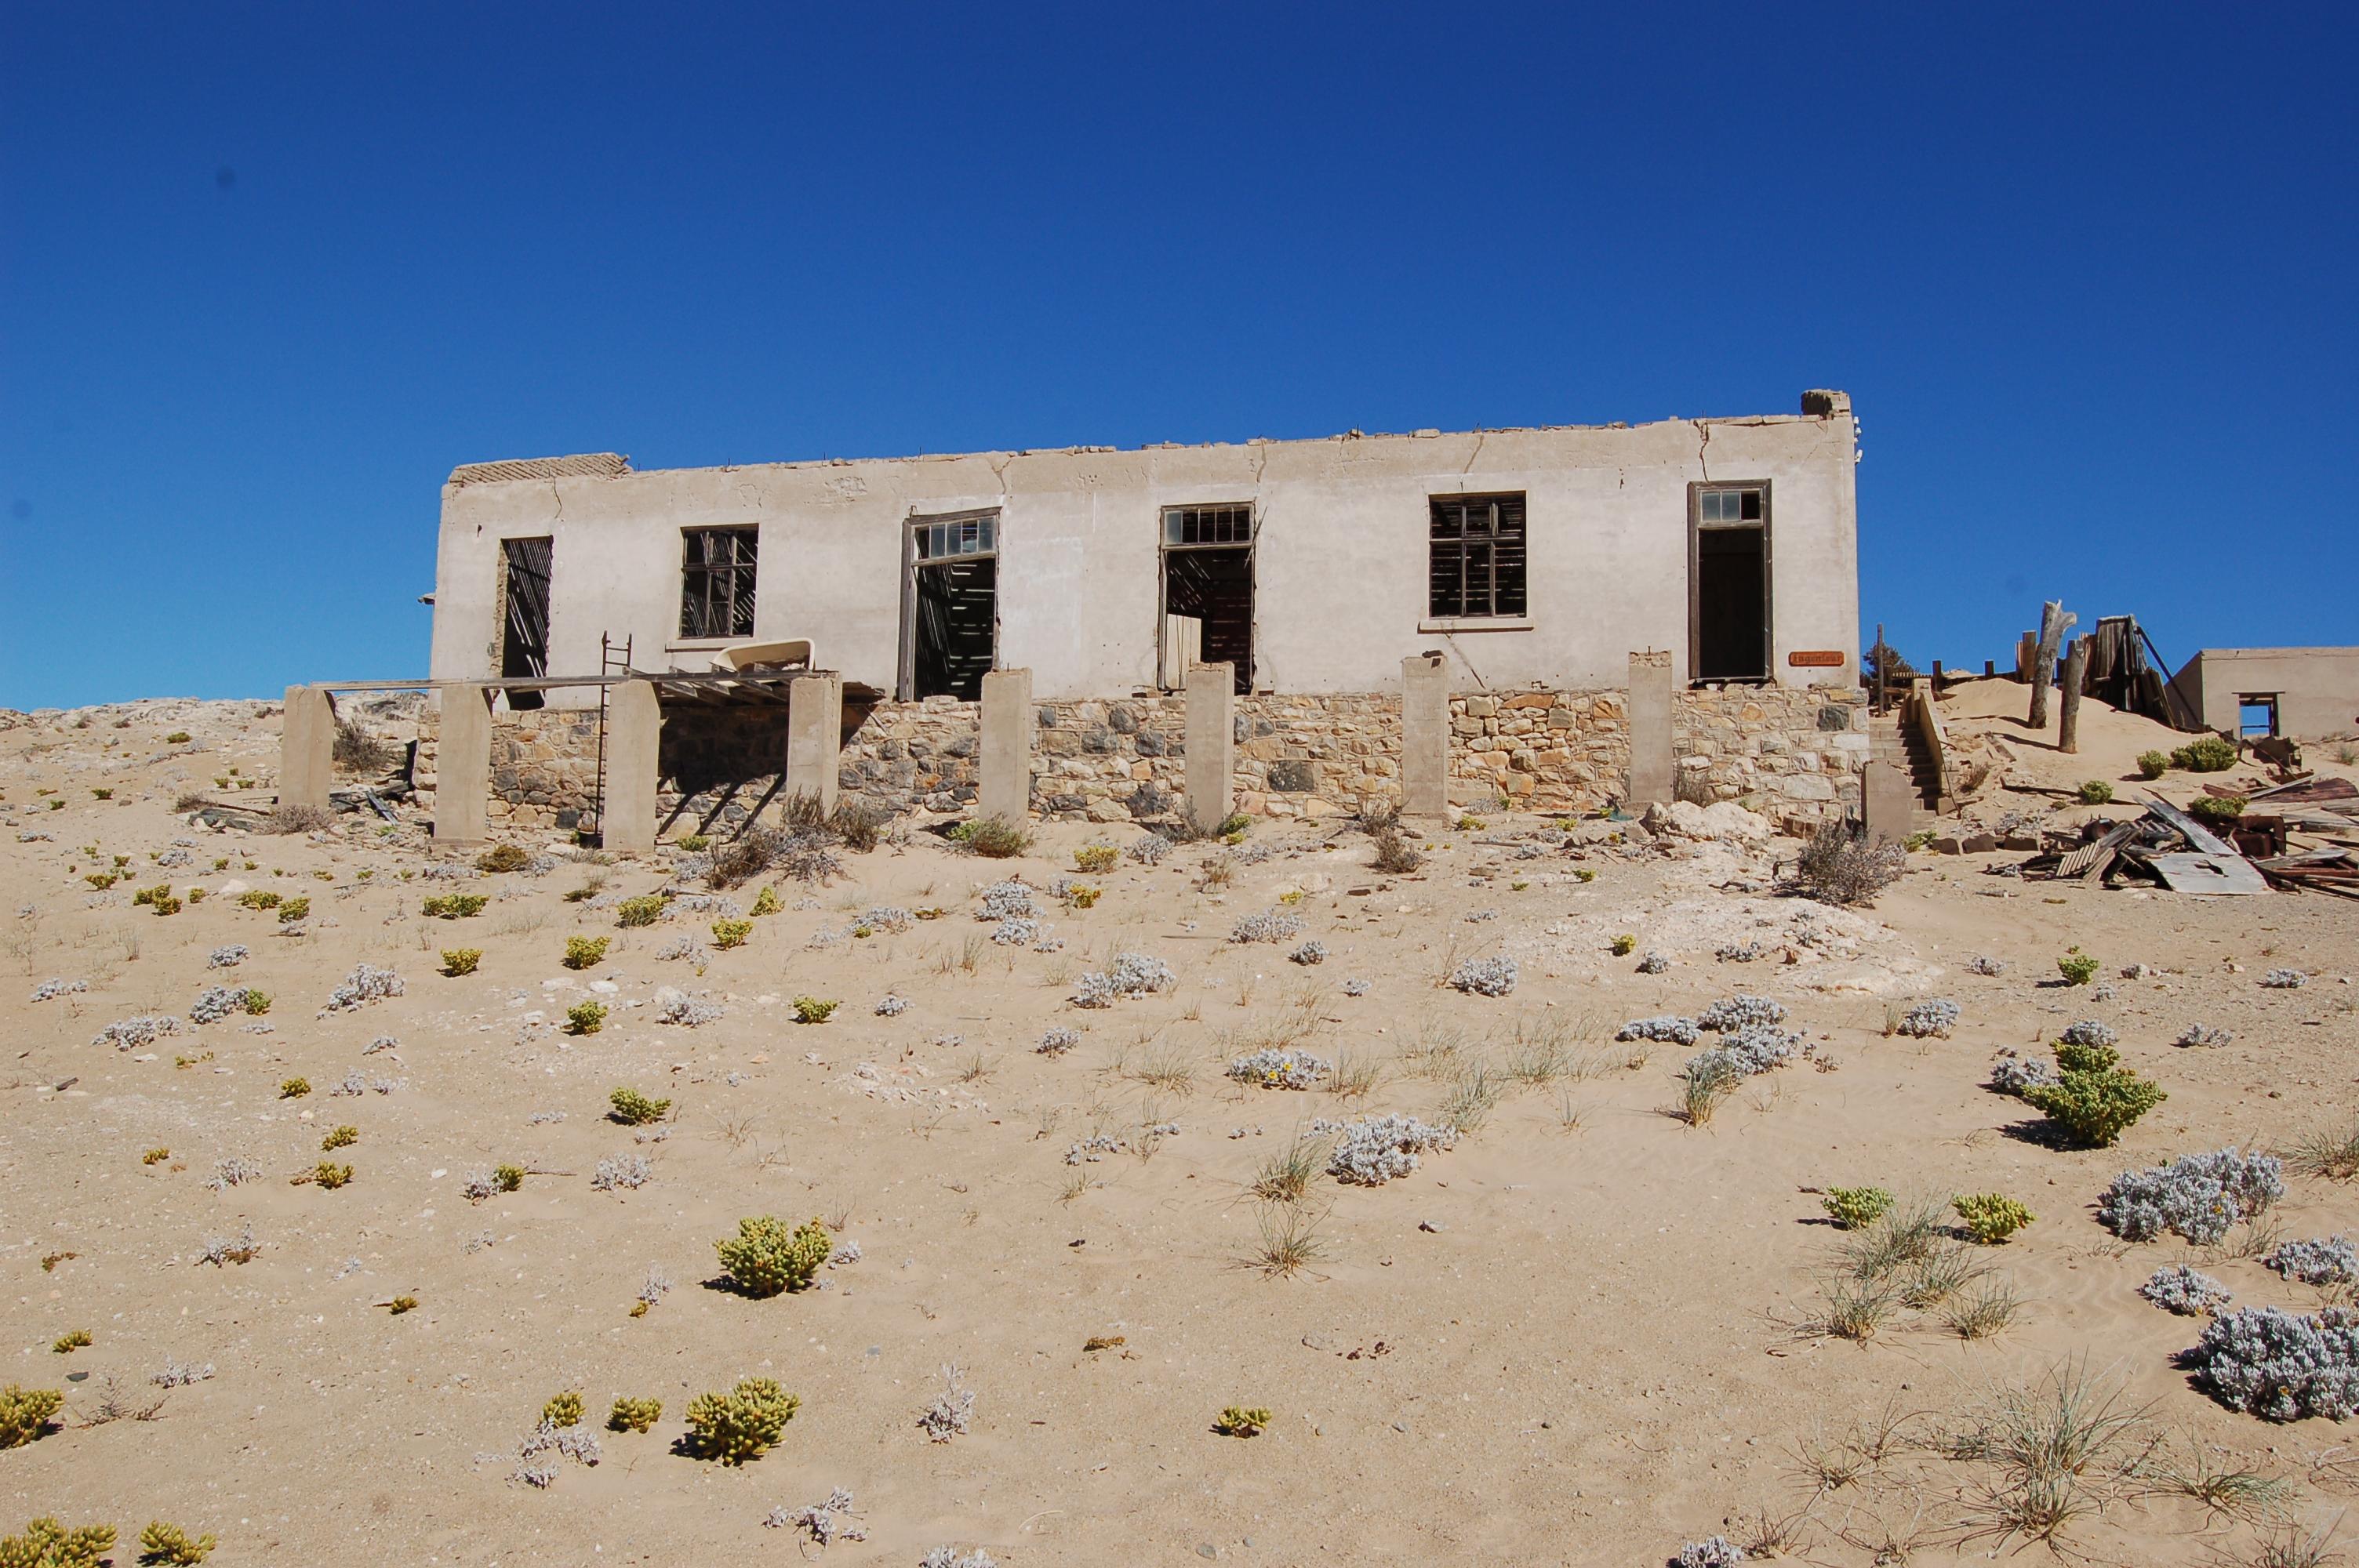 File:Kolmanskop, Namibia-1.jpg - Wikimedia Commons